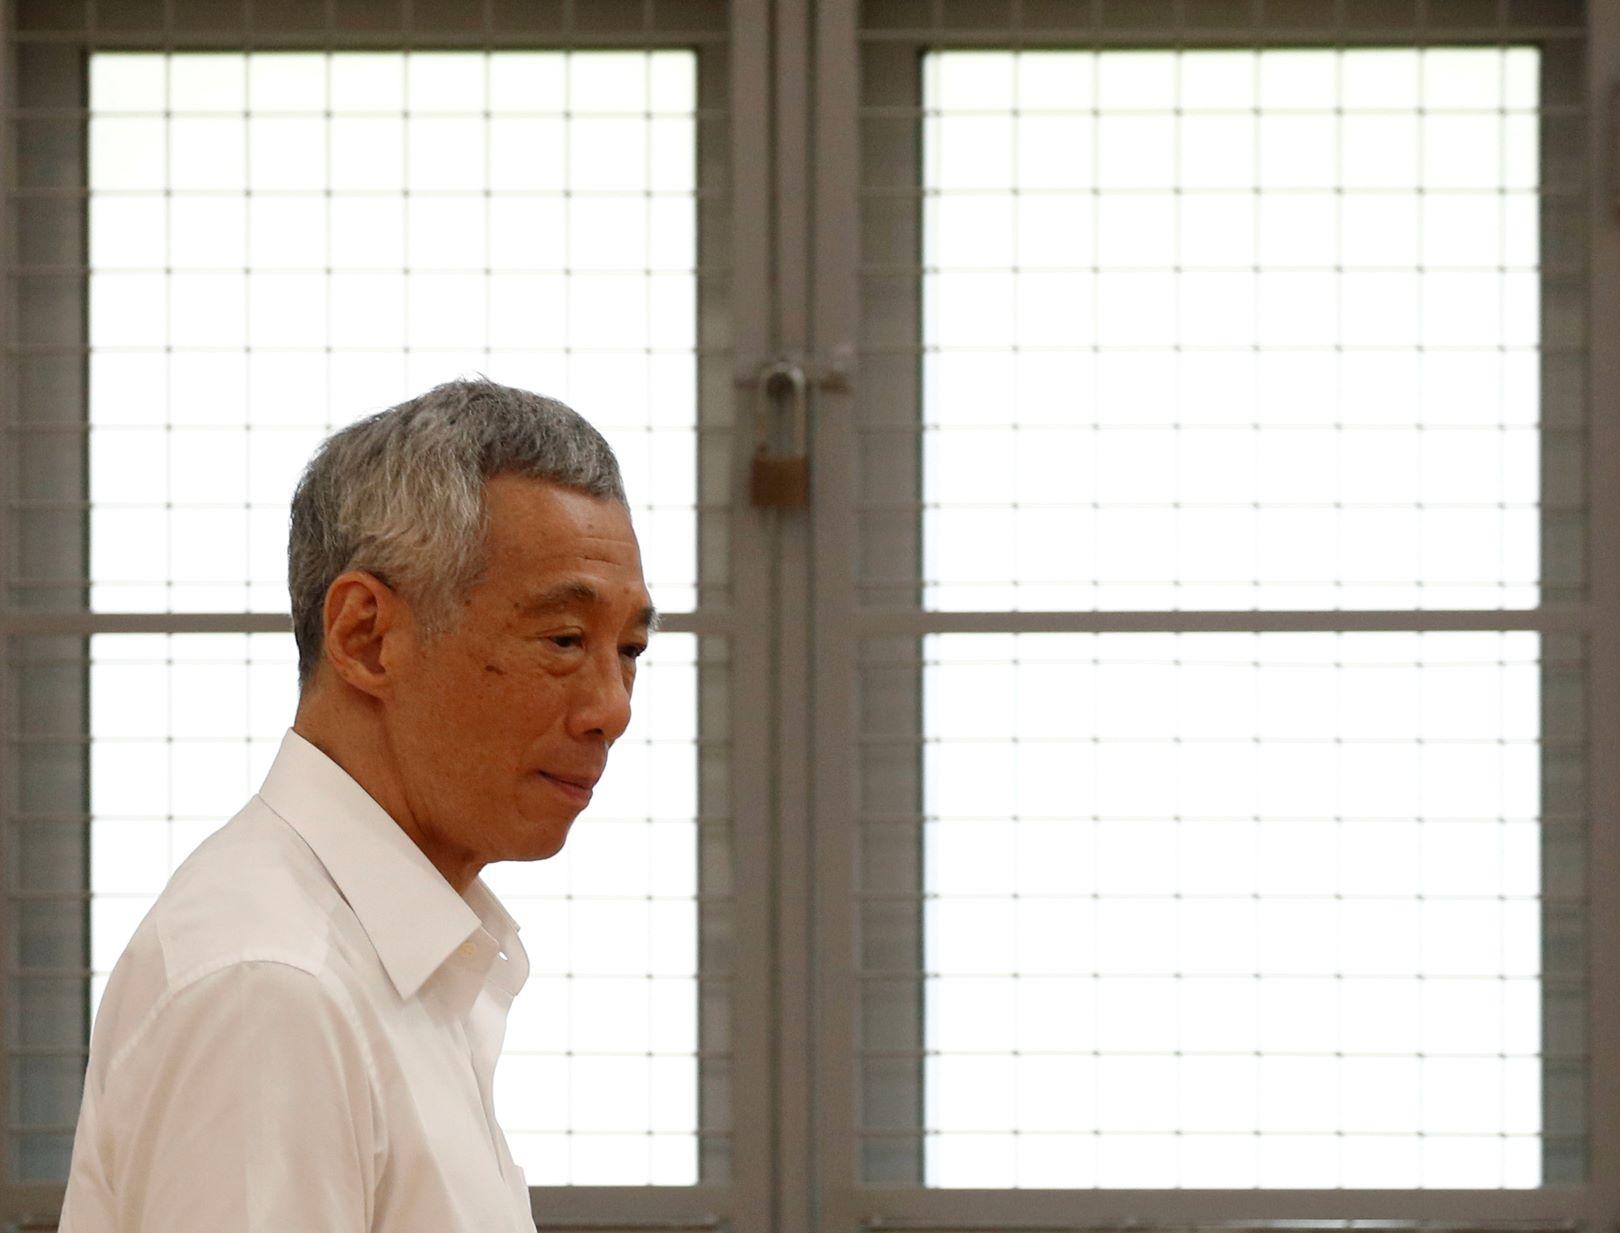 Lee's unforced error on Singapore succession